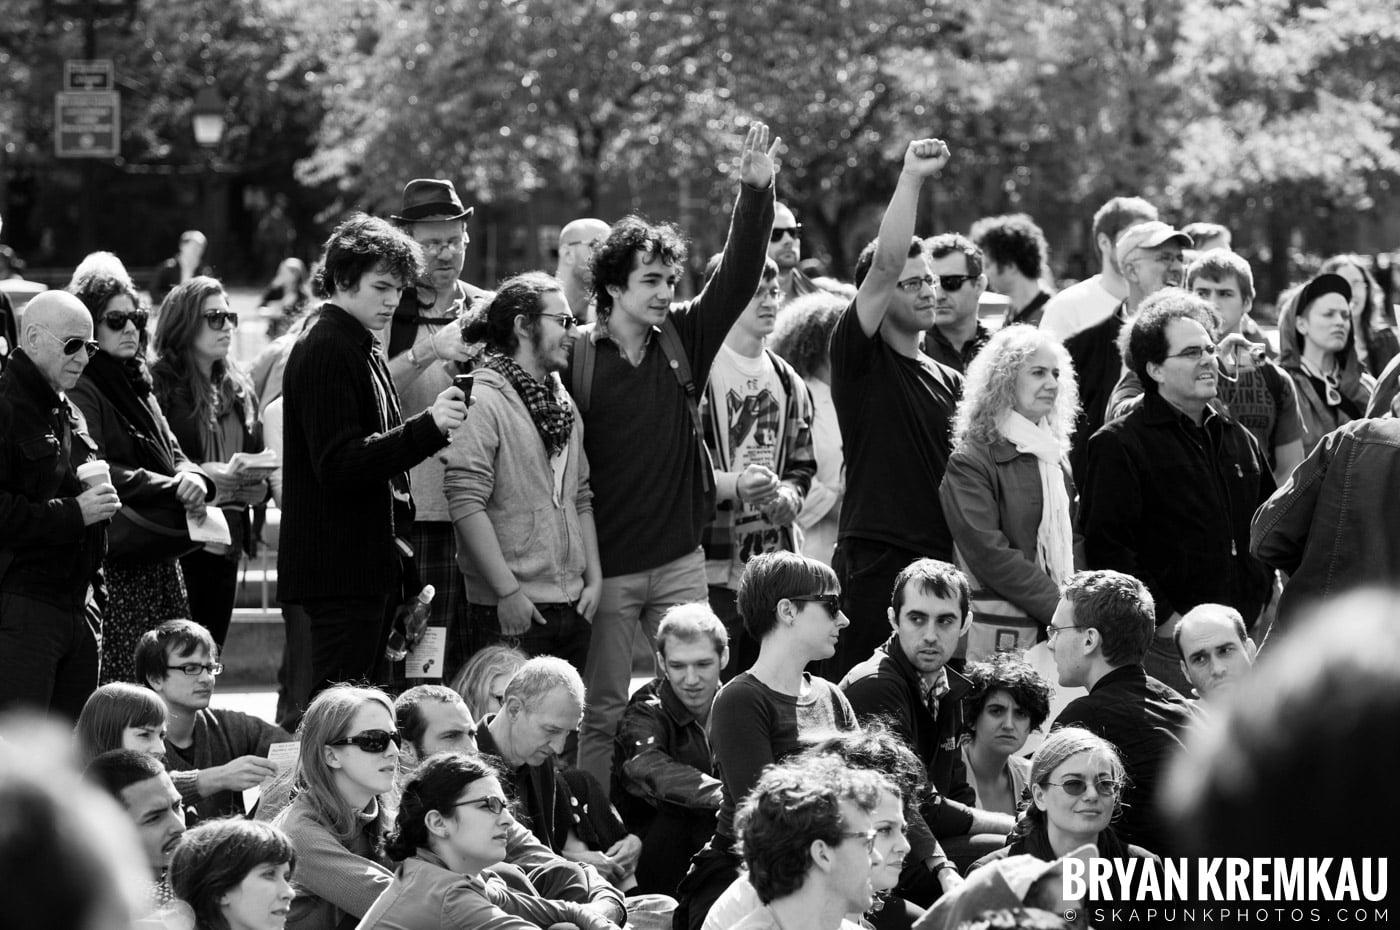 Occupy Wall Street @ Zuccotti Park and Washington Square Park, NYC - 10.15.11 (83)